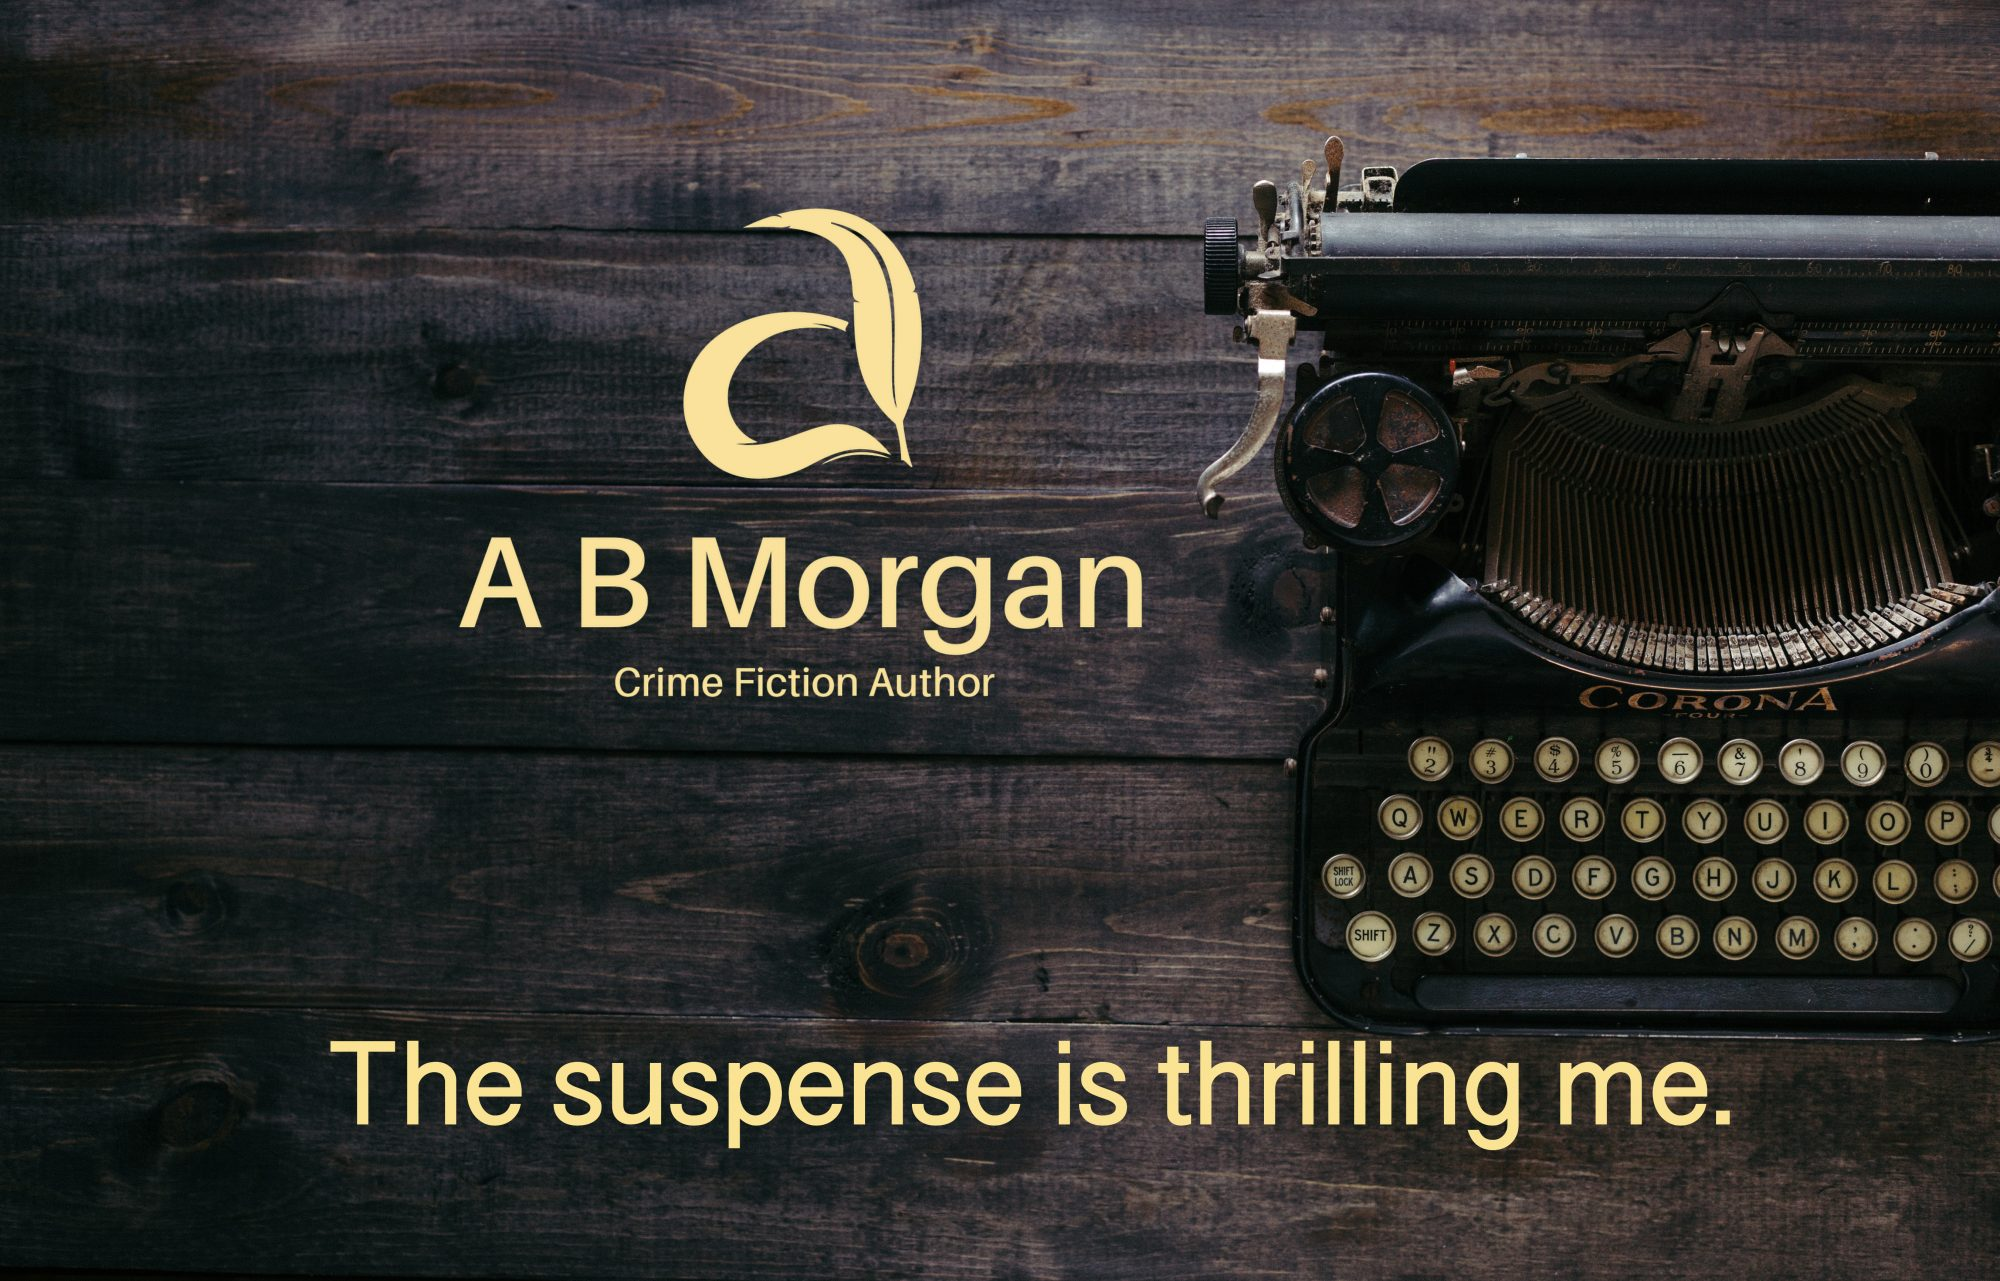 AB Morgan